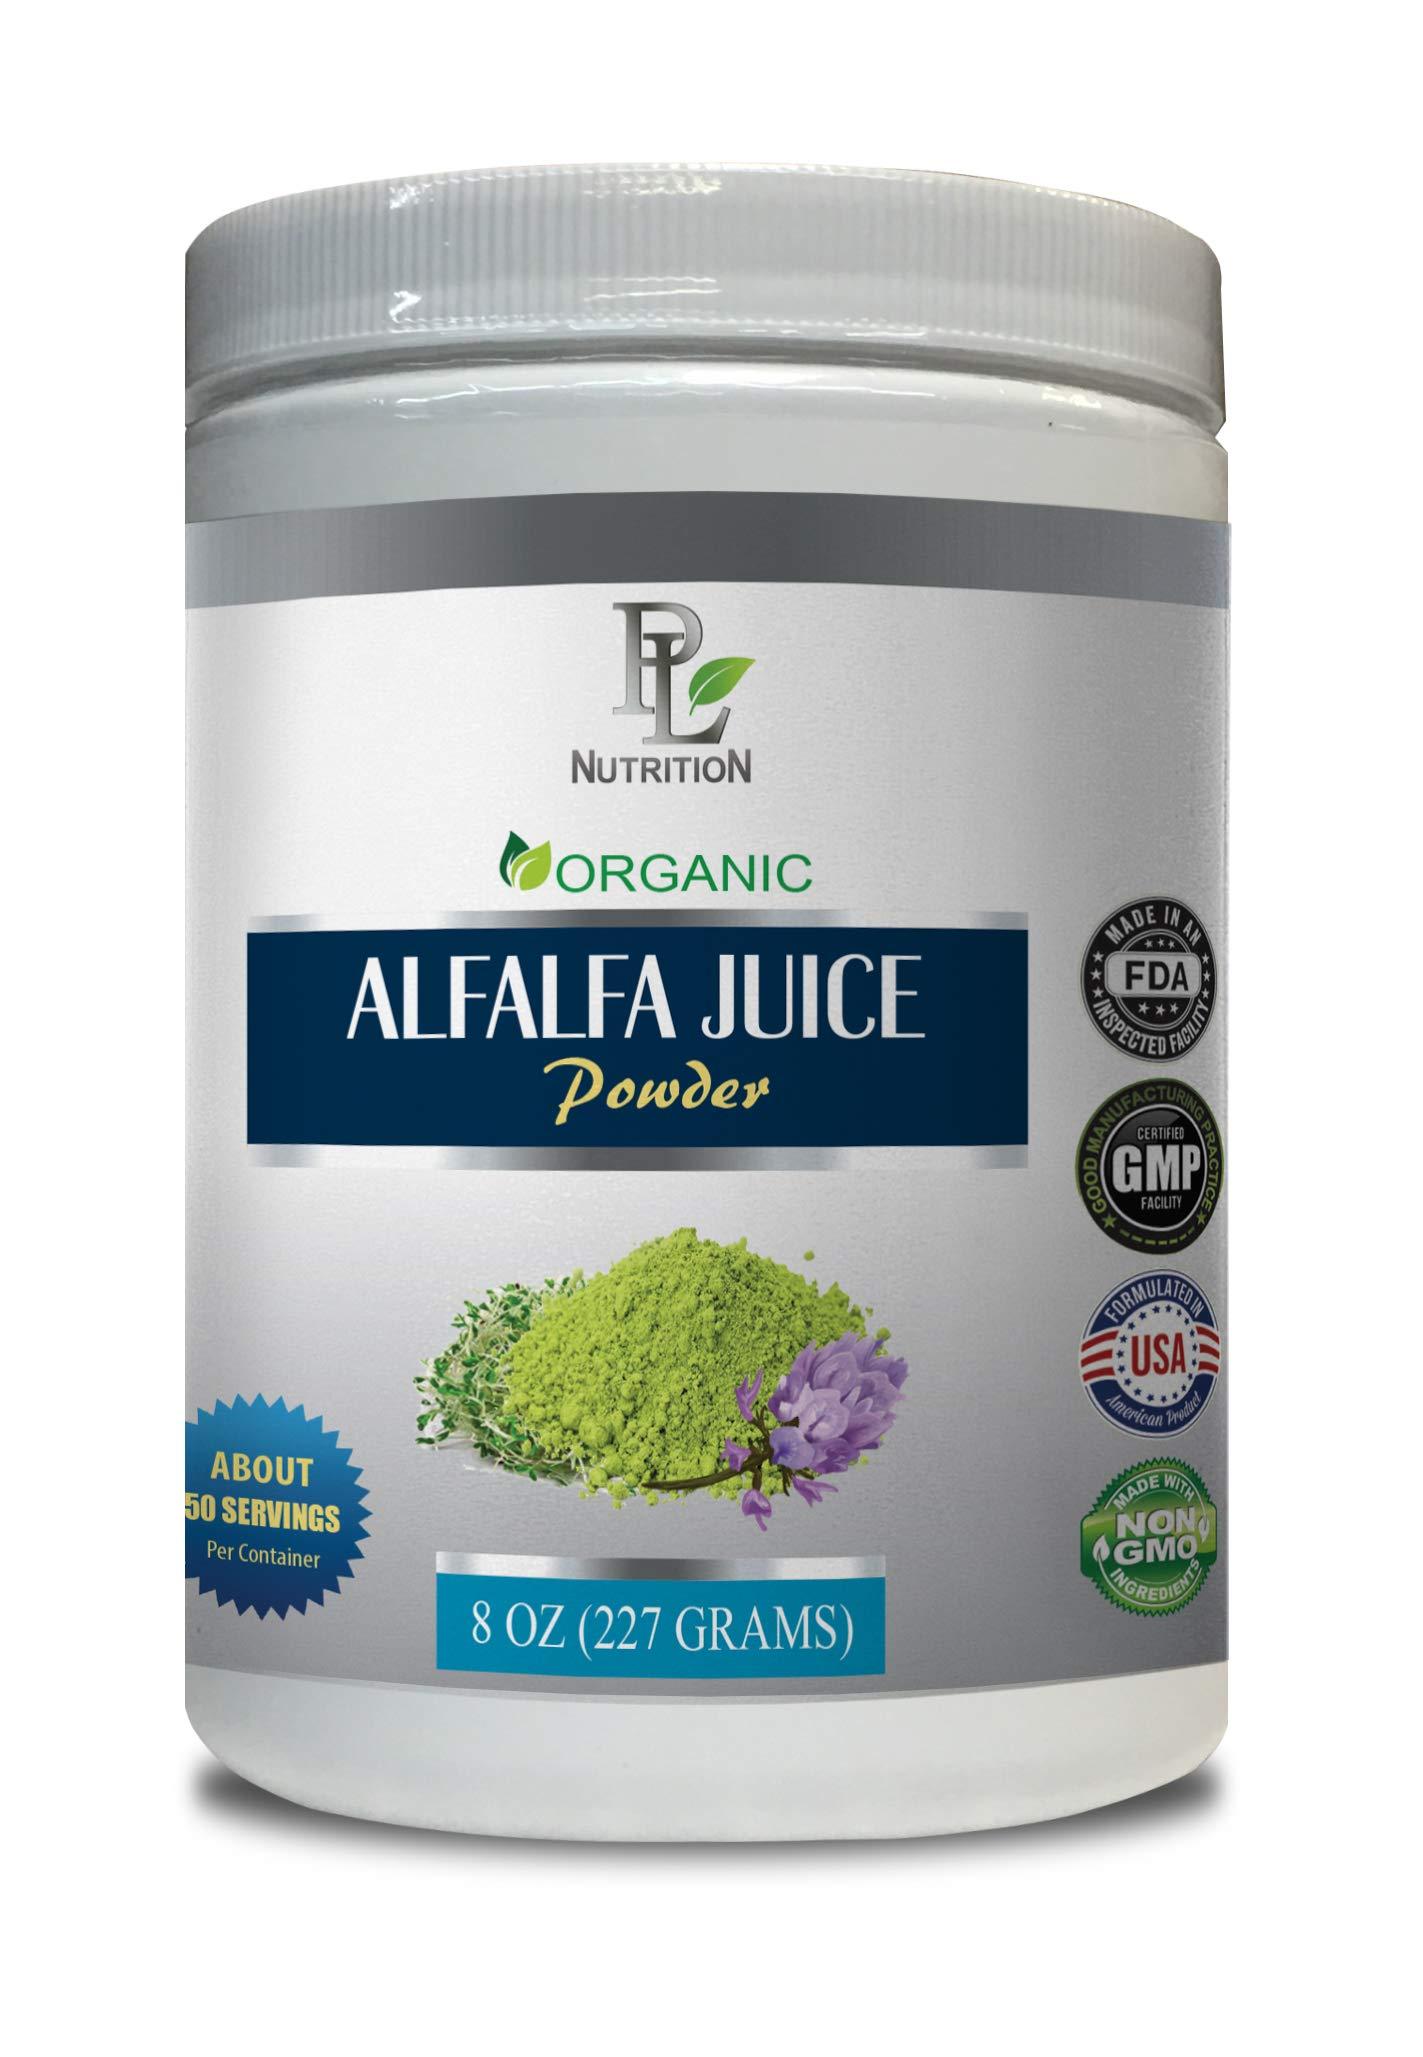 antioxidant Extreme - Alfalfa Organic - Juice Powder - Alfalfa Extract - 1 Can 8 OZ (50 Servings)